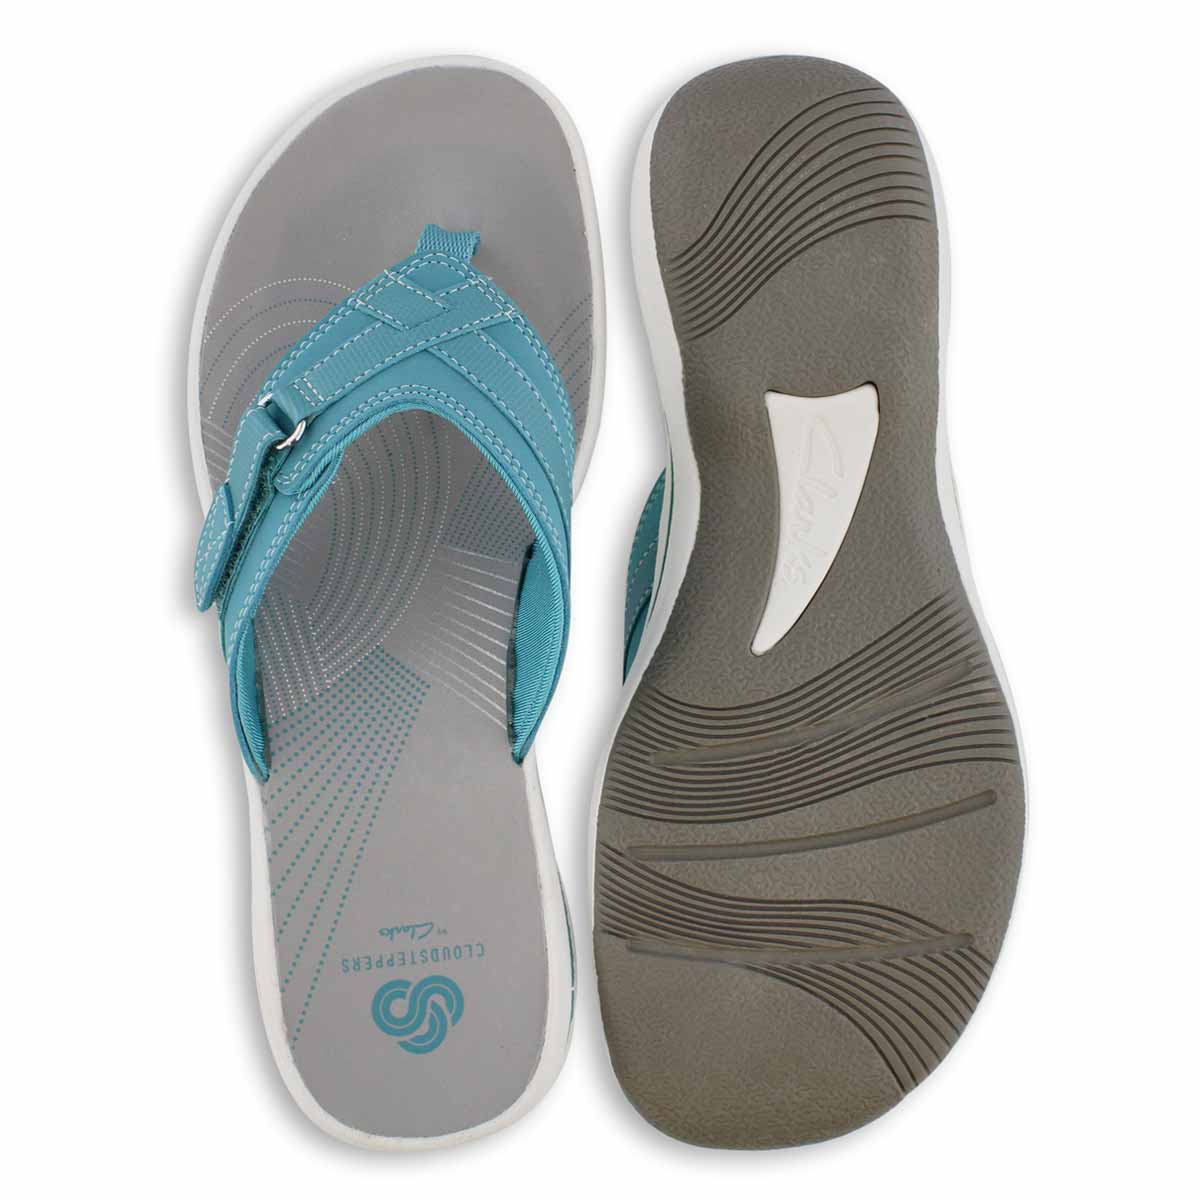 Women's Breeze Sea Thong Sandal - Aqua